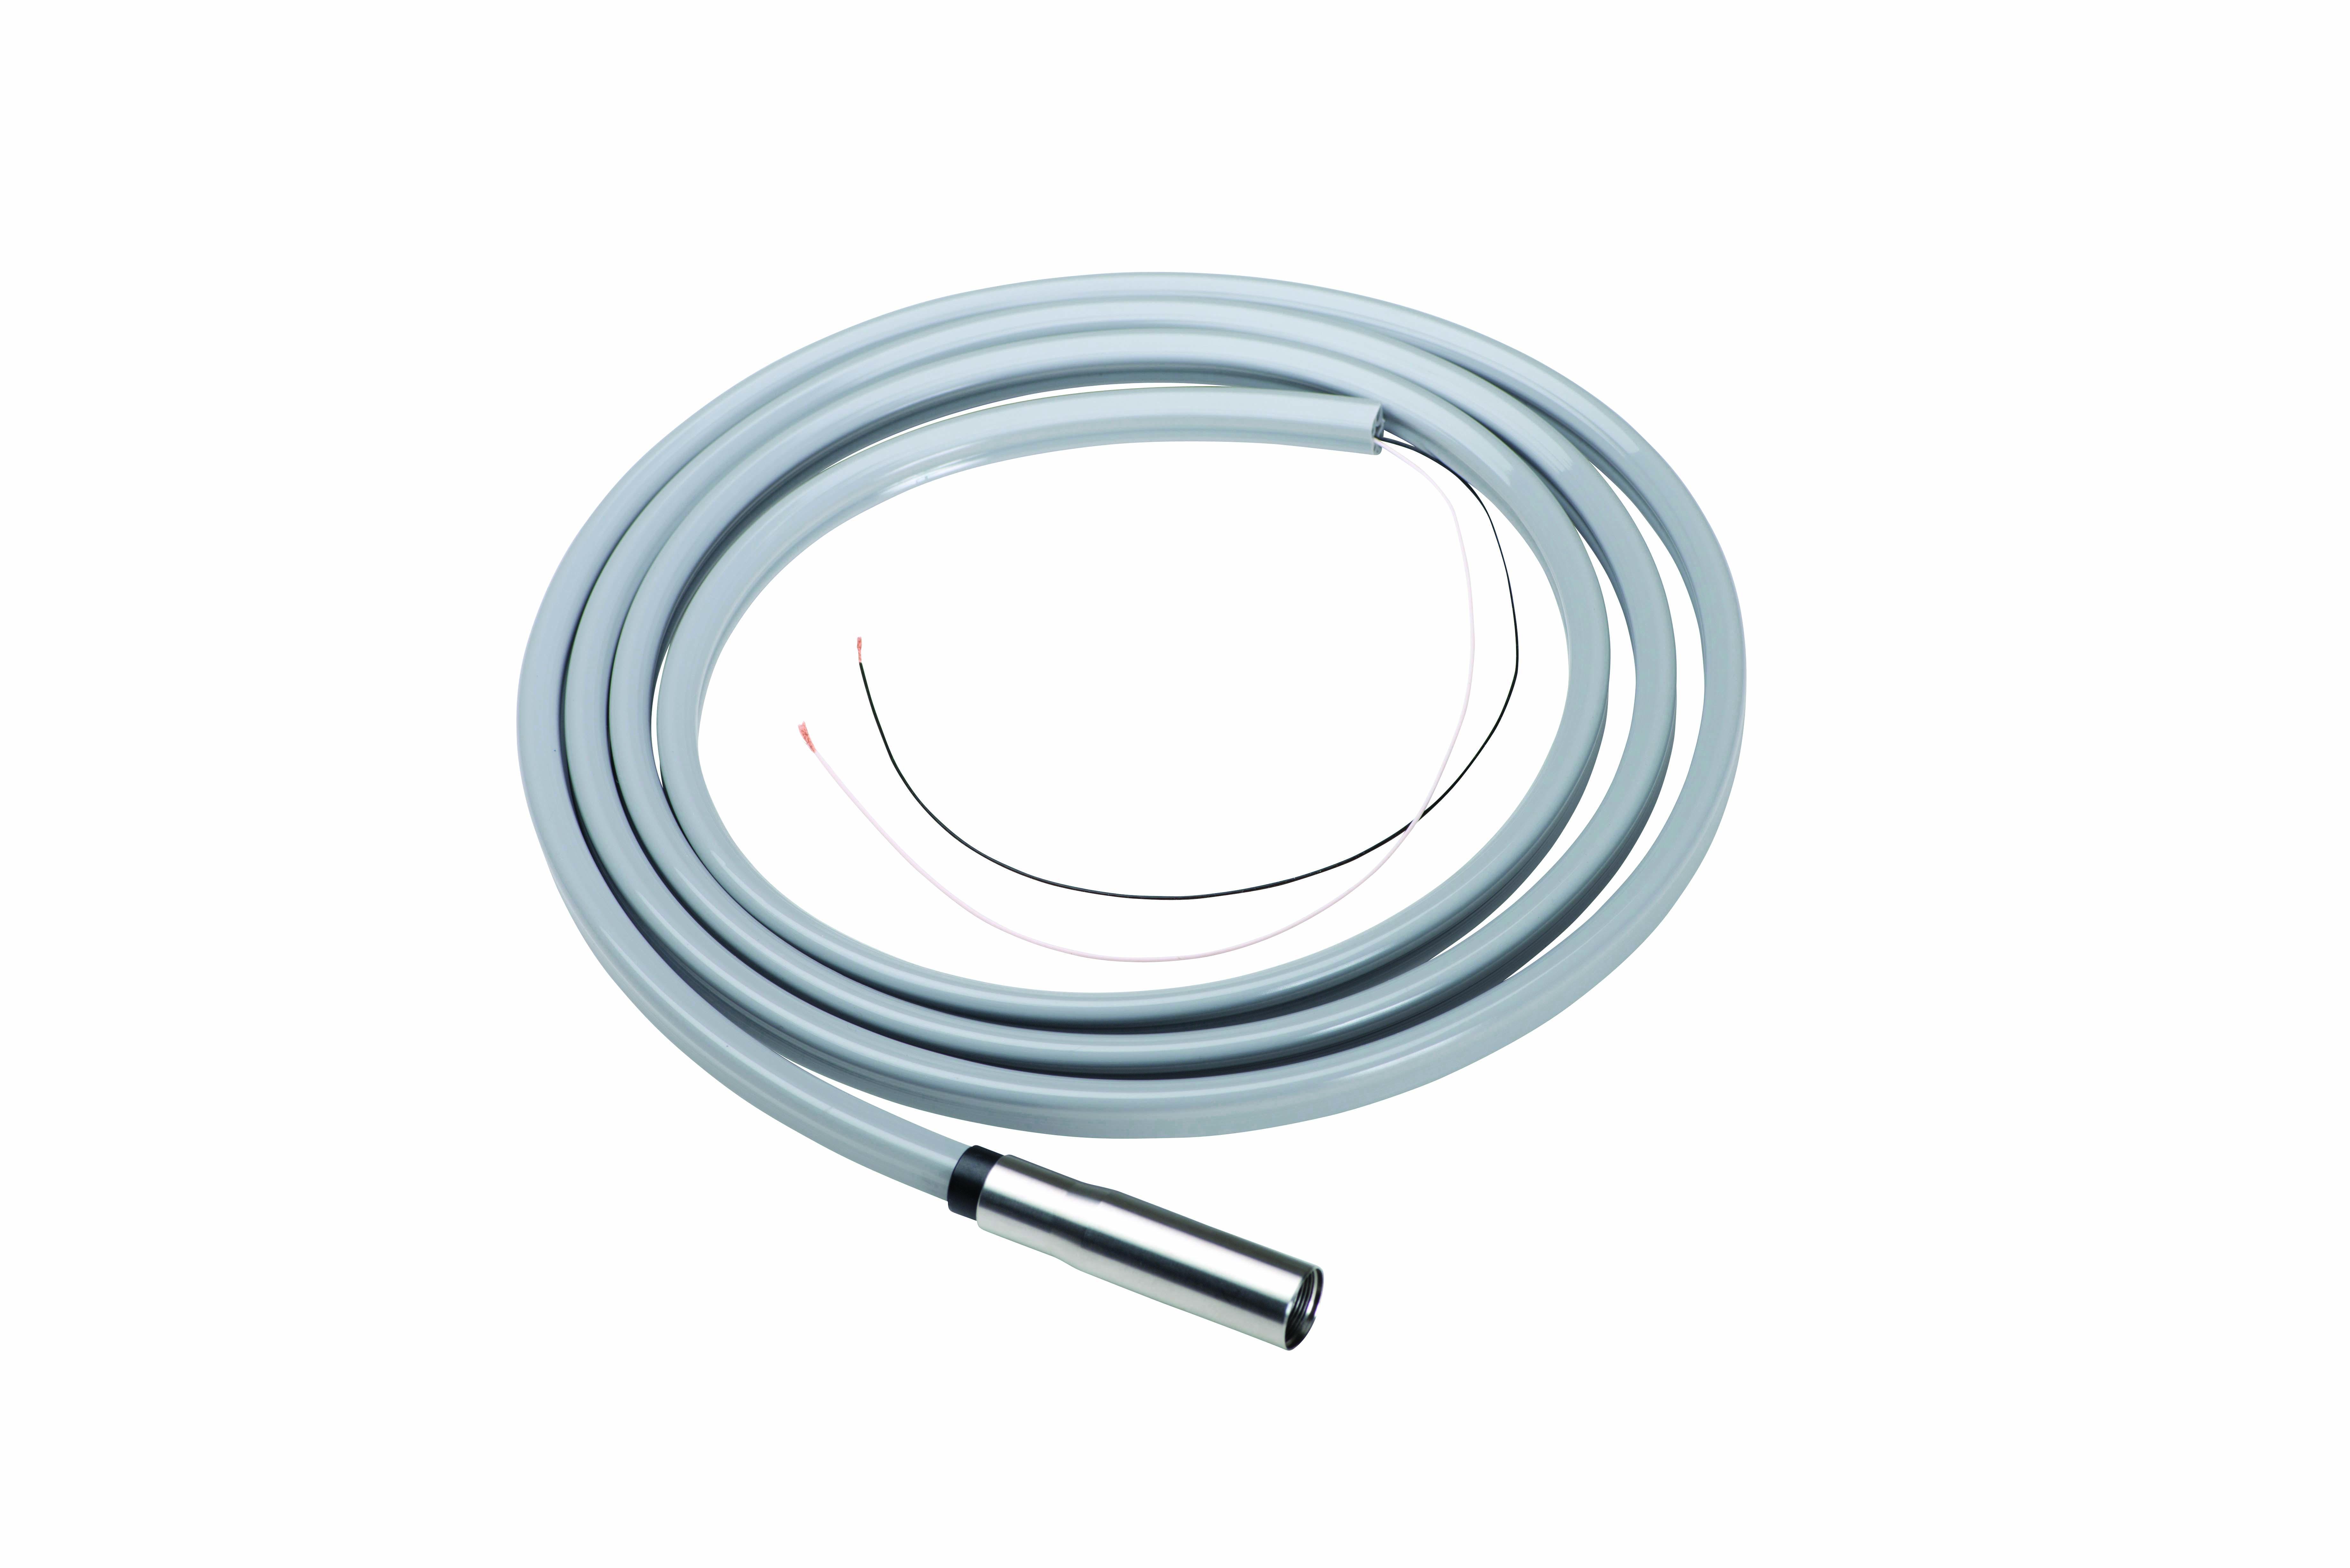 ISO 5-Hole Power Optic HP Tubing, 7', Gray